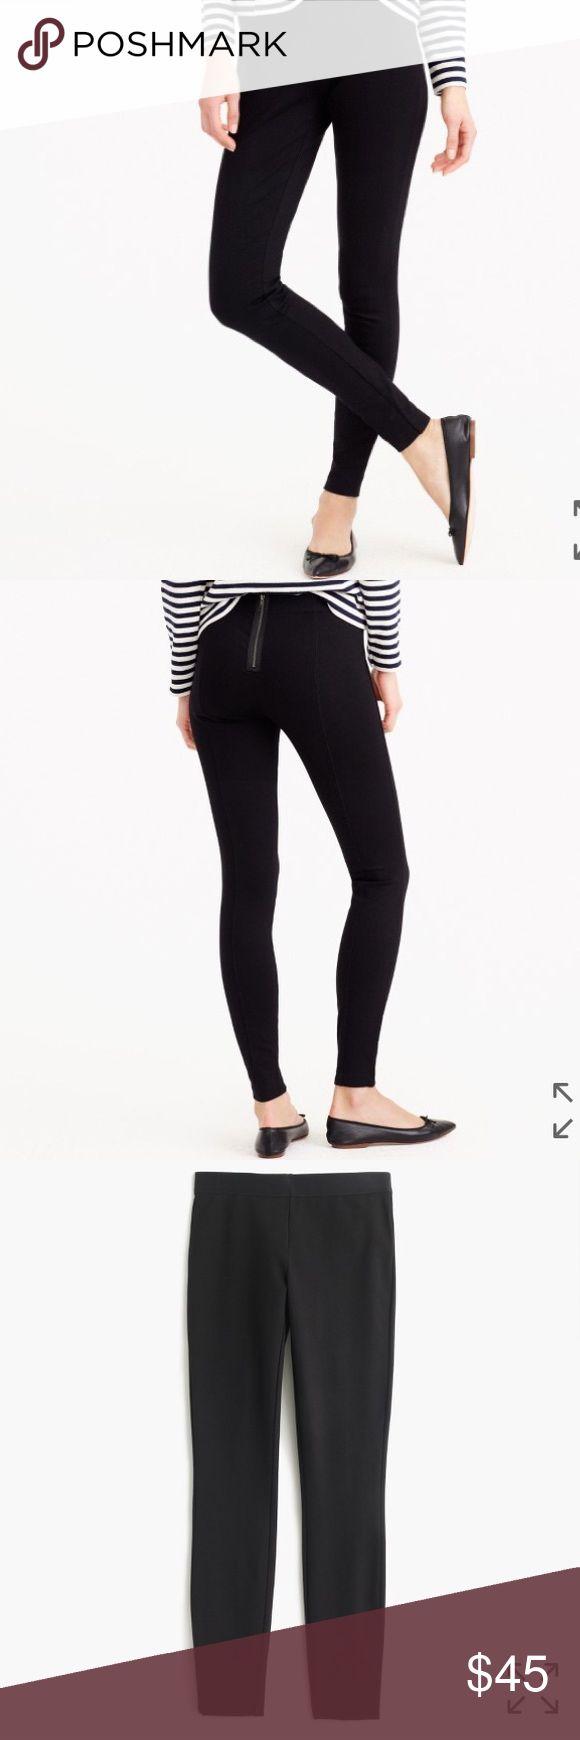 "J crew Pixie Pants Size 6S Heather Charcoal Gray J crew Pixie Pants Size 6S Short Heather Charcoal Gray Zipper closure on back  Elastic waist line  Waist- 14"" Inseam- 28.5"" J. Crew Pants Leggings"